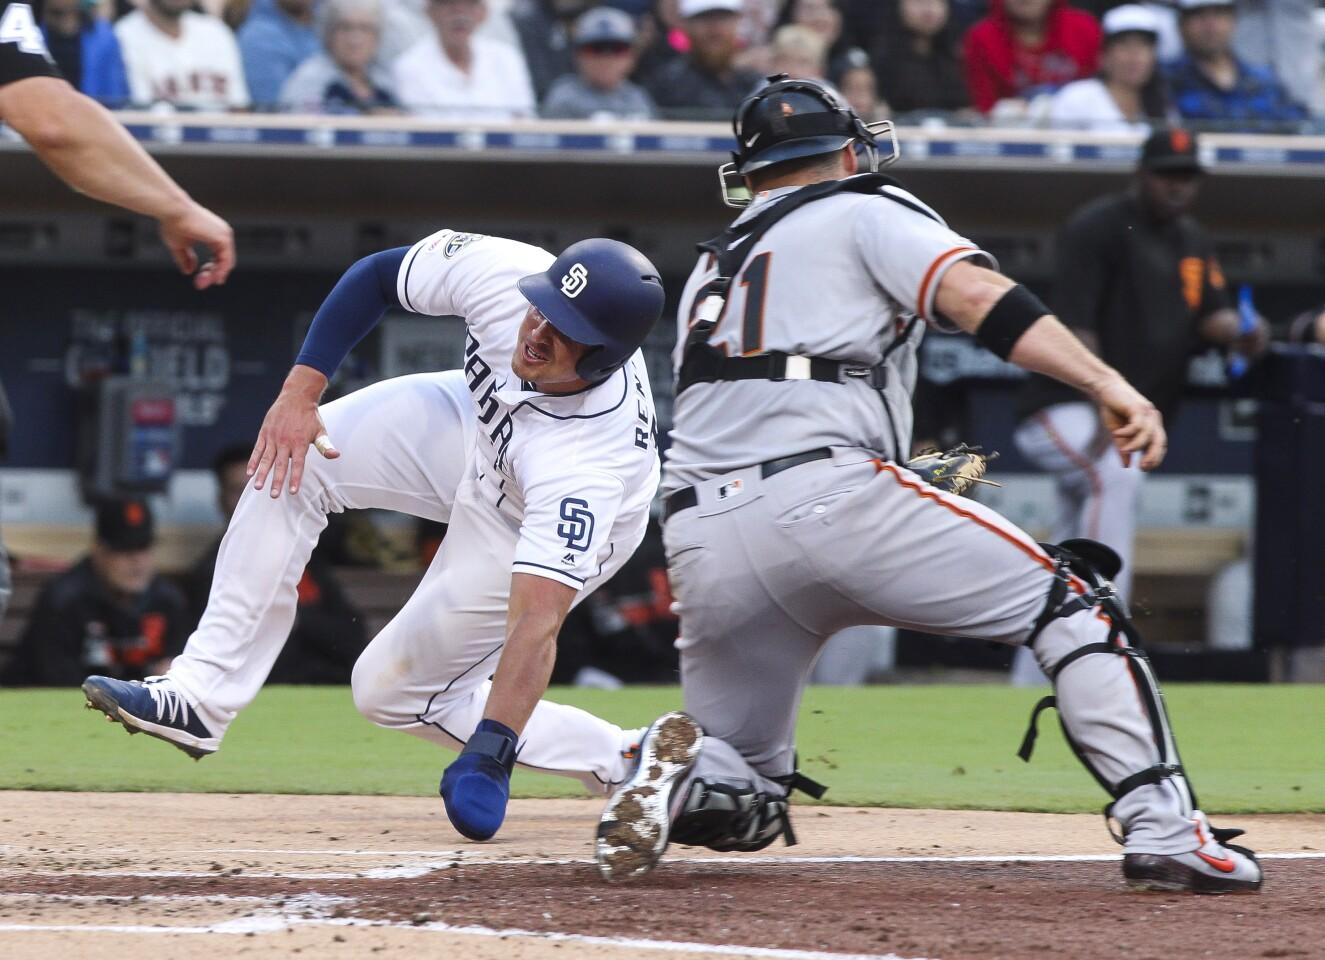 Padres vs. Giants